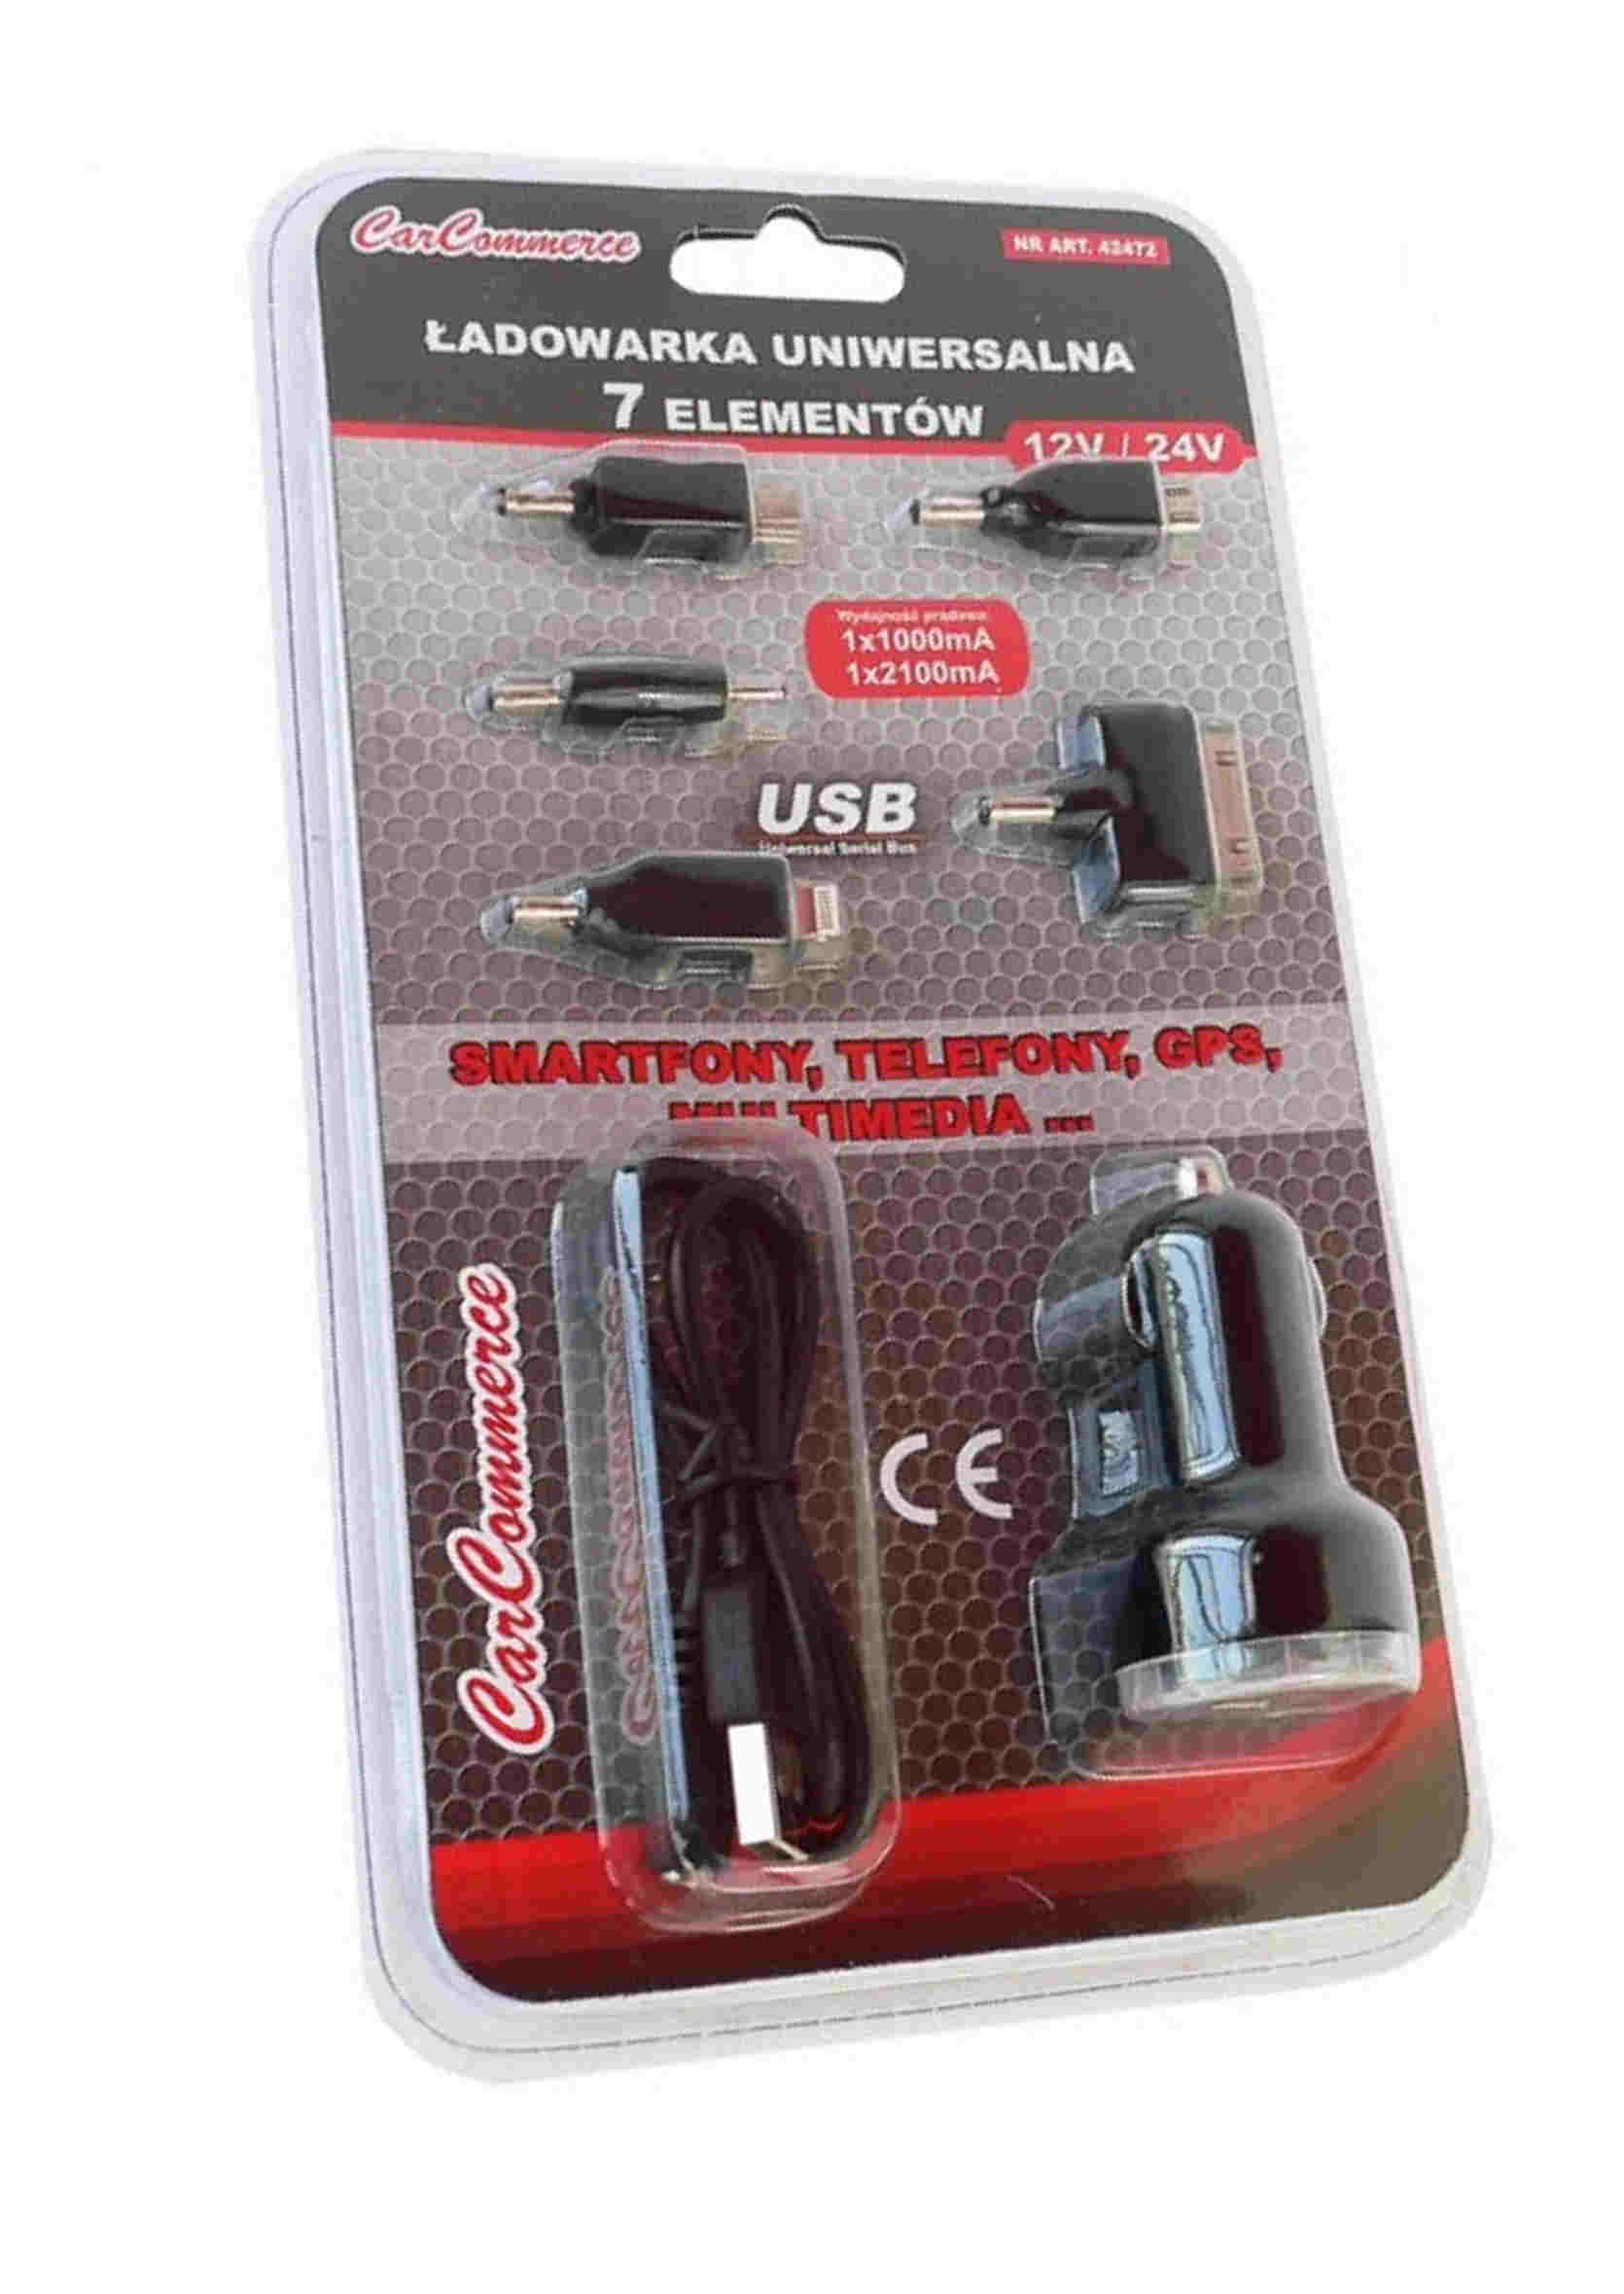 CarCommerce Ładowarka Samochodowa 2x USB 12V 24V 5 Końcówek z Kablem